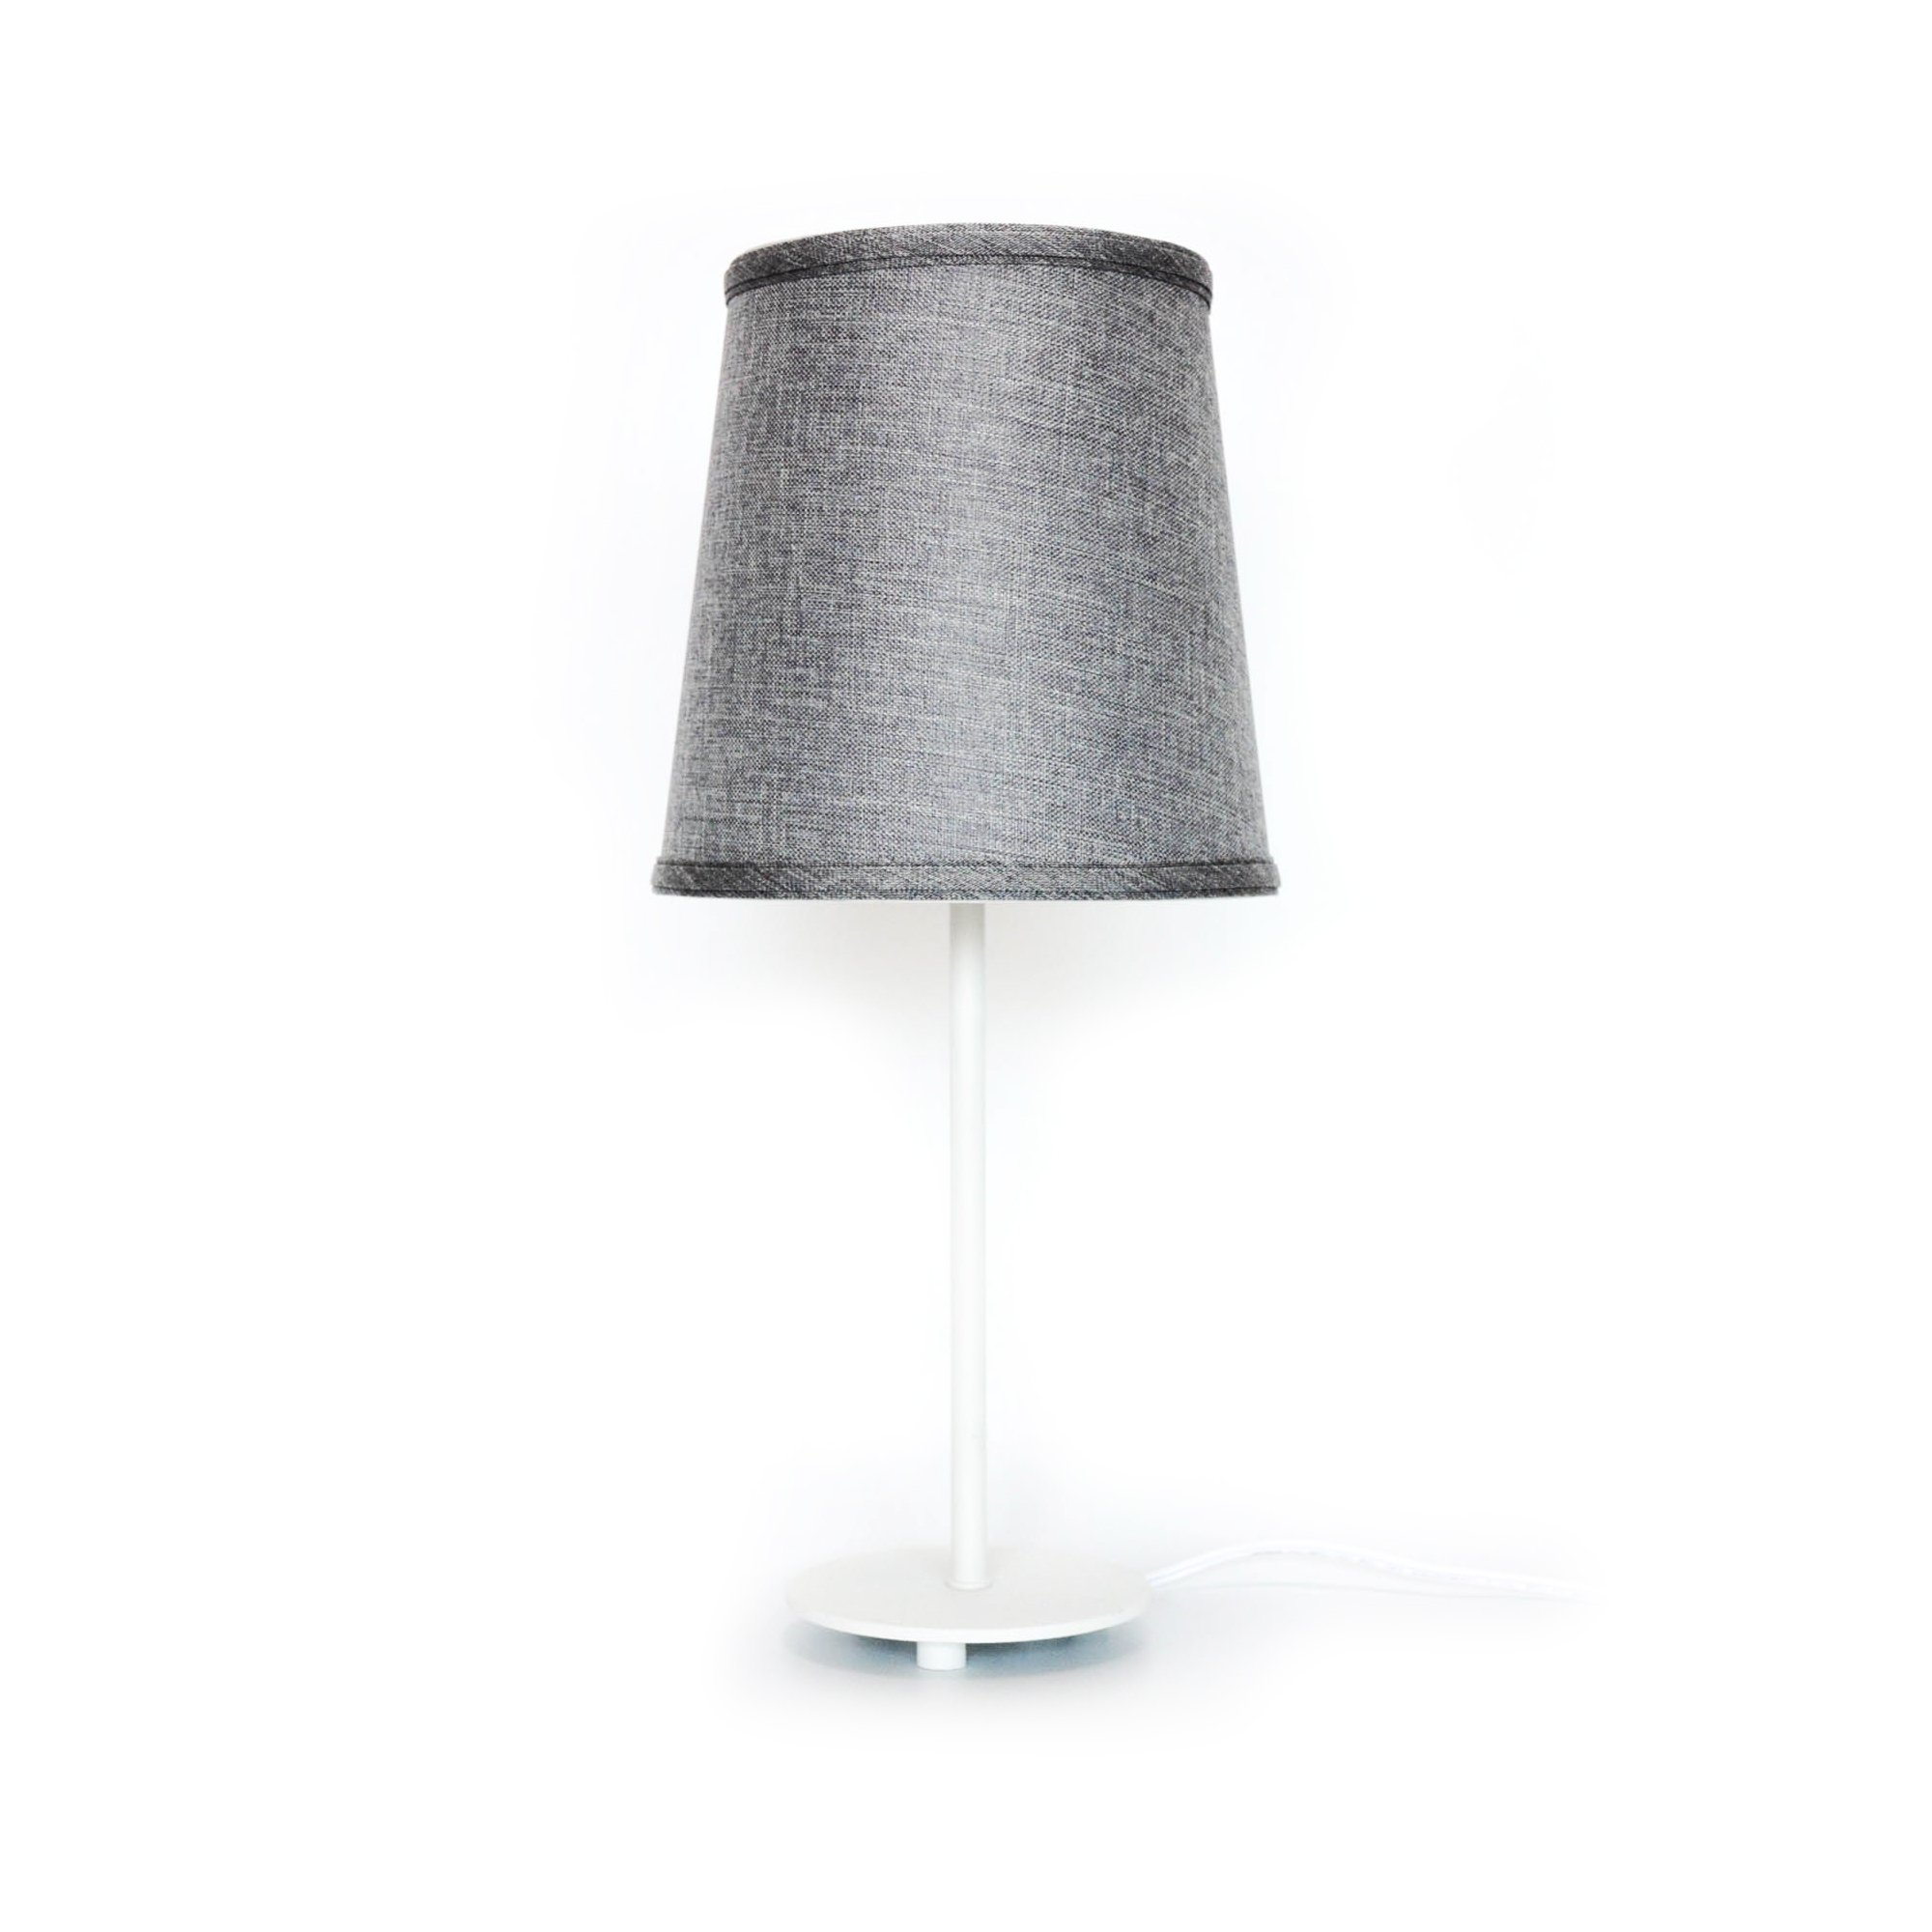 Sha.Tang-Modern Table Lamp Metal Base Fabric Lamp Shade Night Light for Living Room, Bedroom, College Dorm